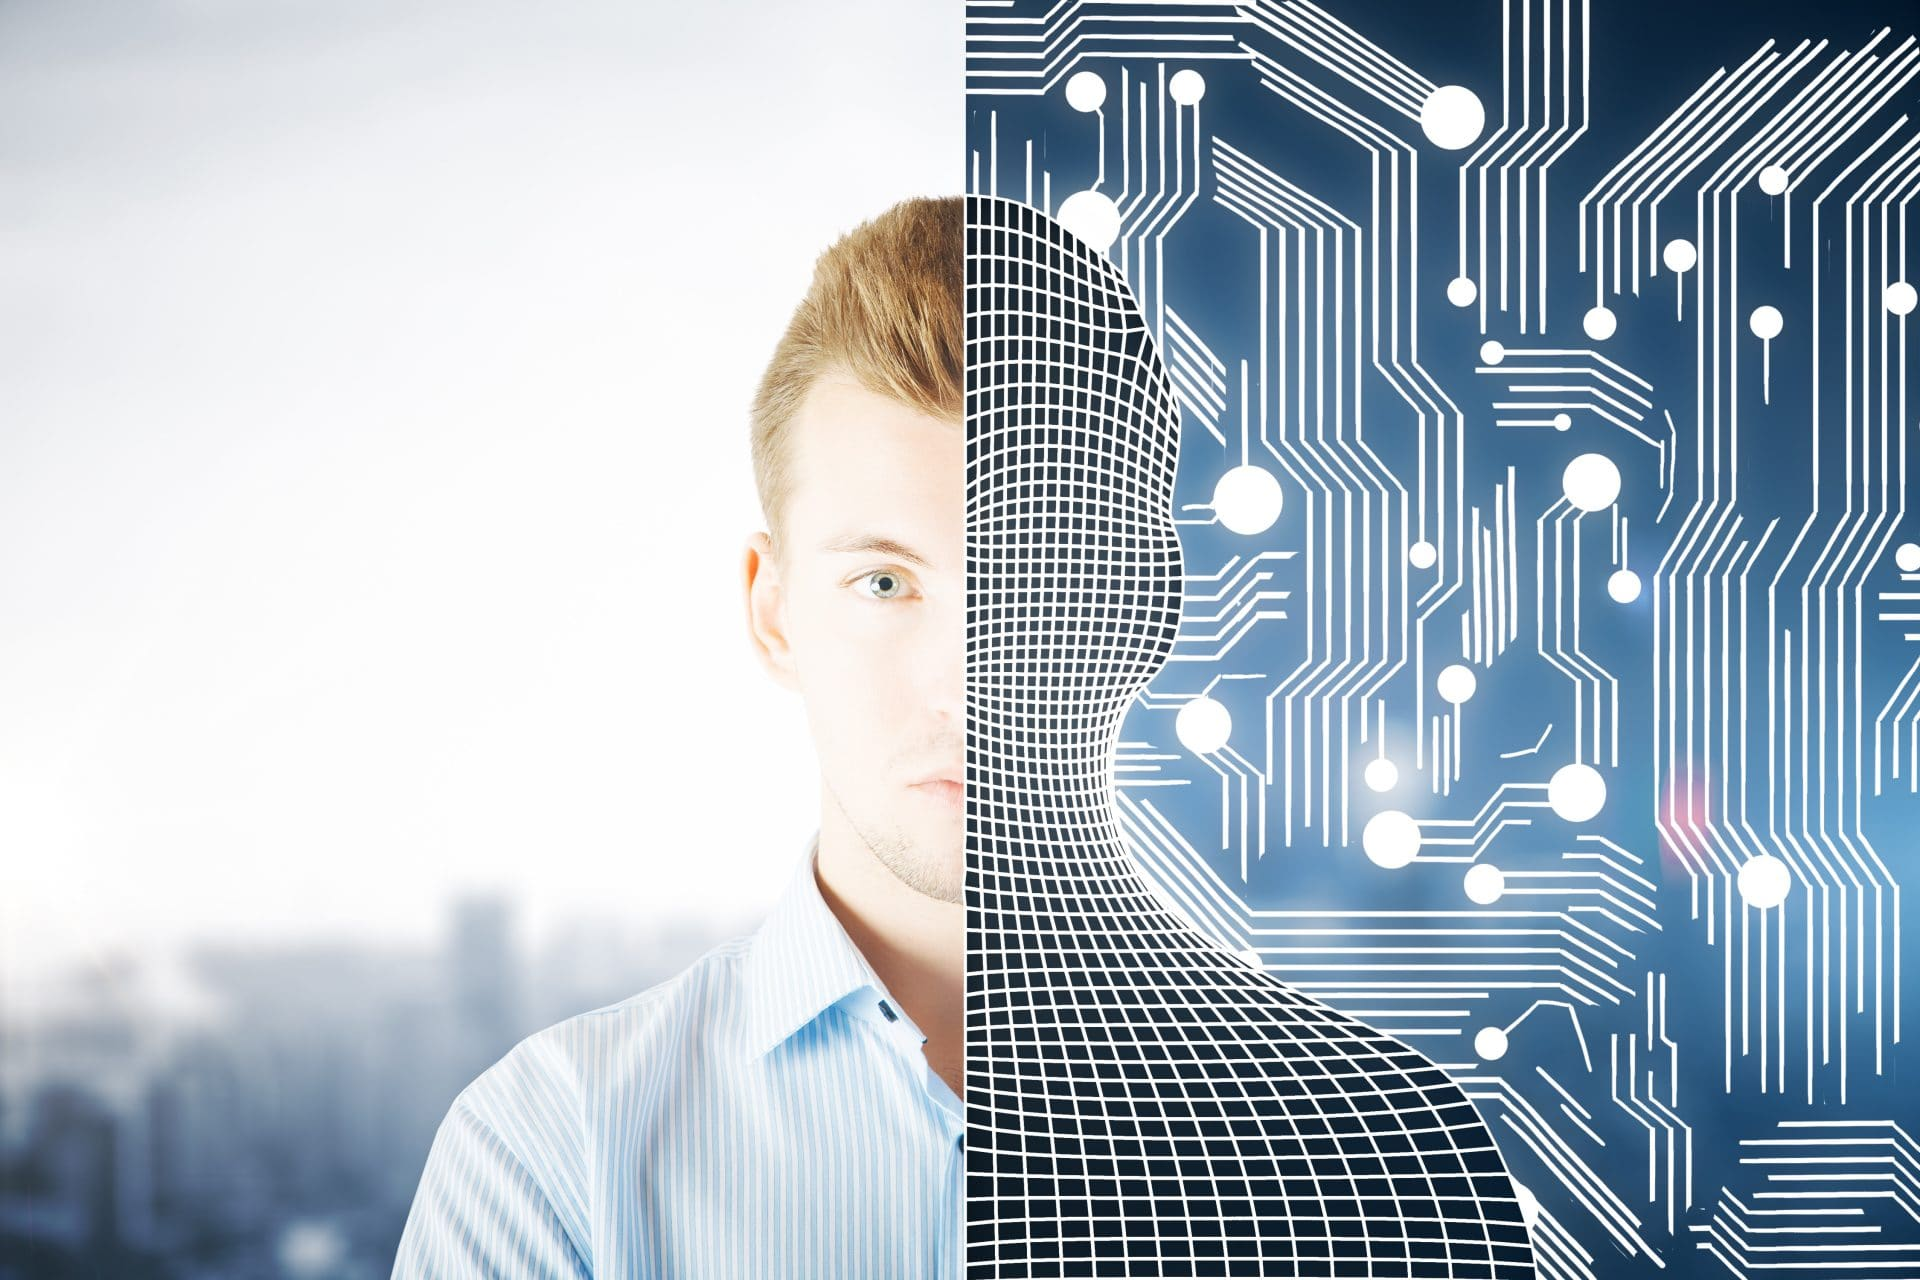 Wie Virtuelle Assistenten als Artifical Coworker funktionieren können